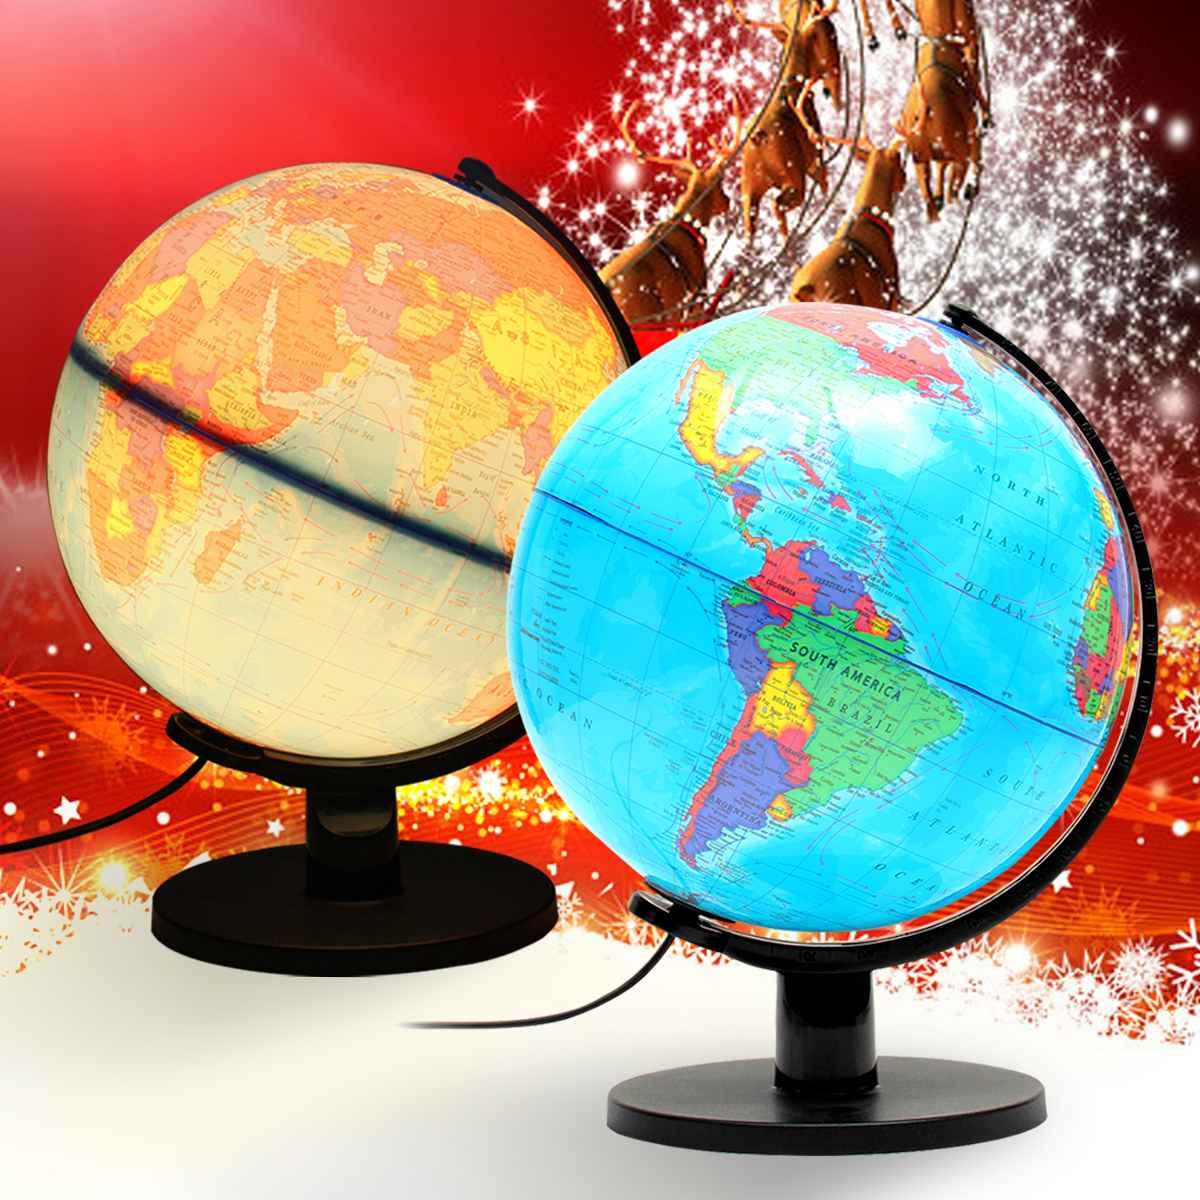 25cm LED luz mundo Tierra globo mapa enseñanza de Geografia juguete educativo con soporte hogar Oficina Decoración regalo suministros escolares